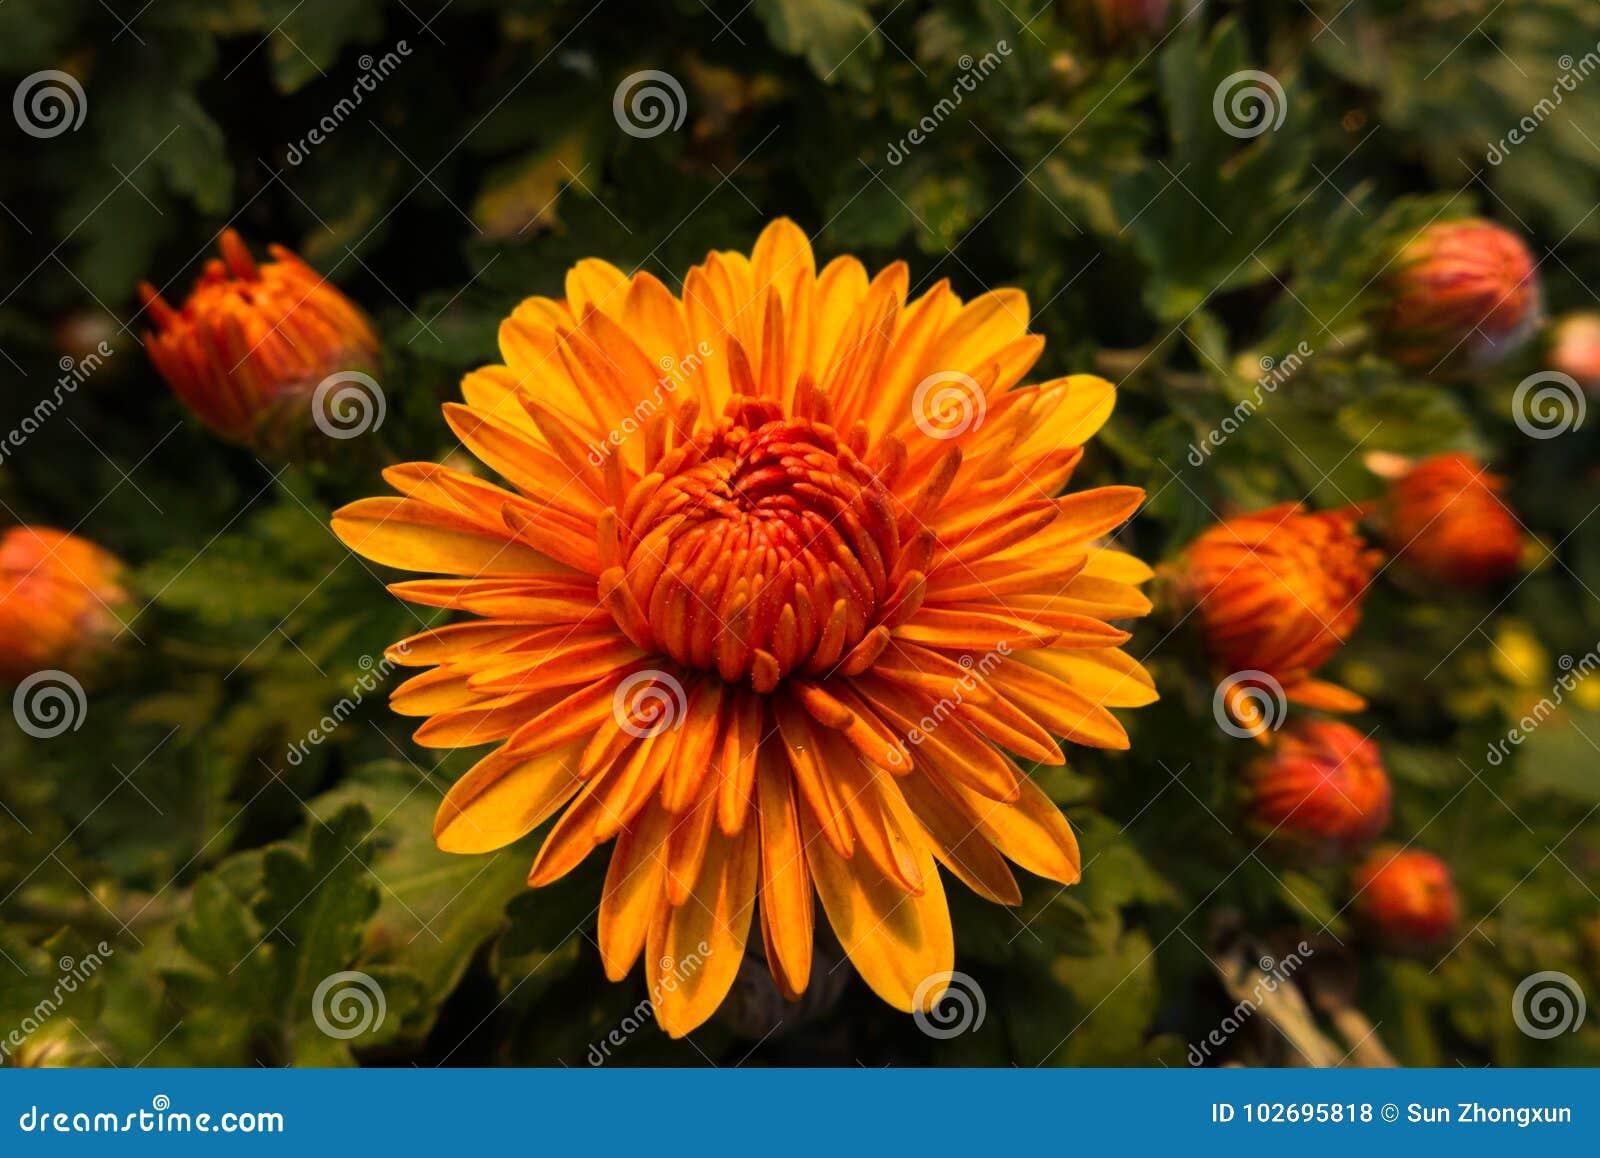 Chrysanthemum Stock Photo Image Of Symbol Longevity 102695818